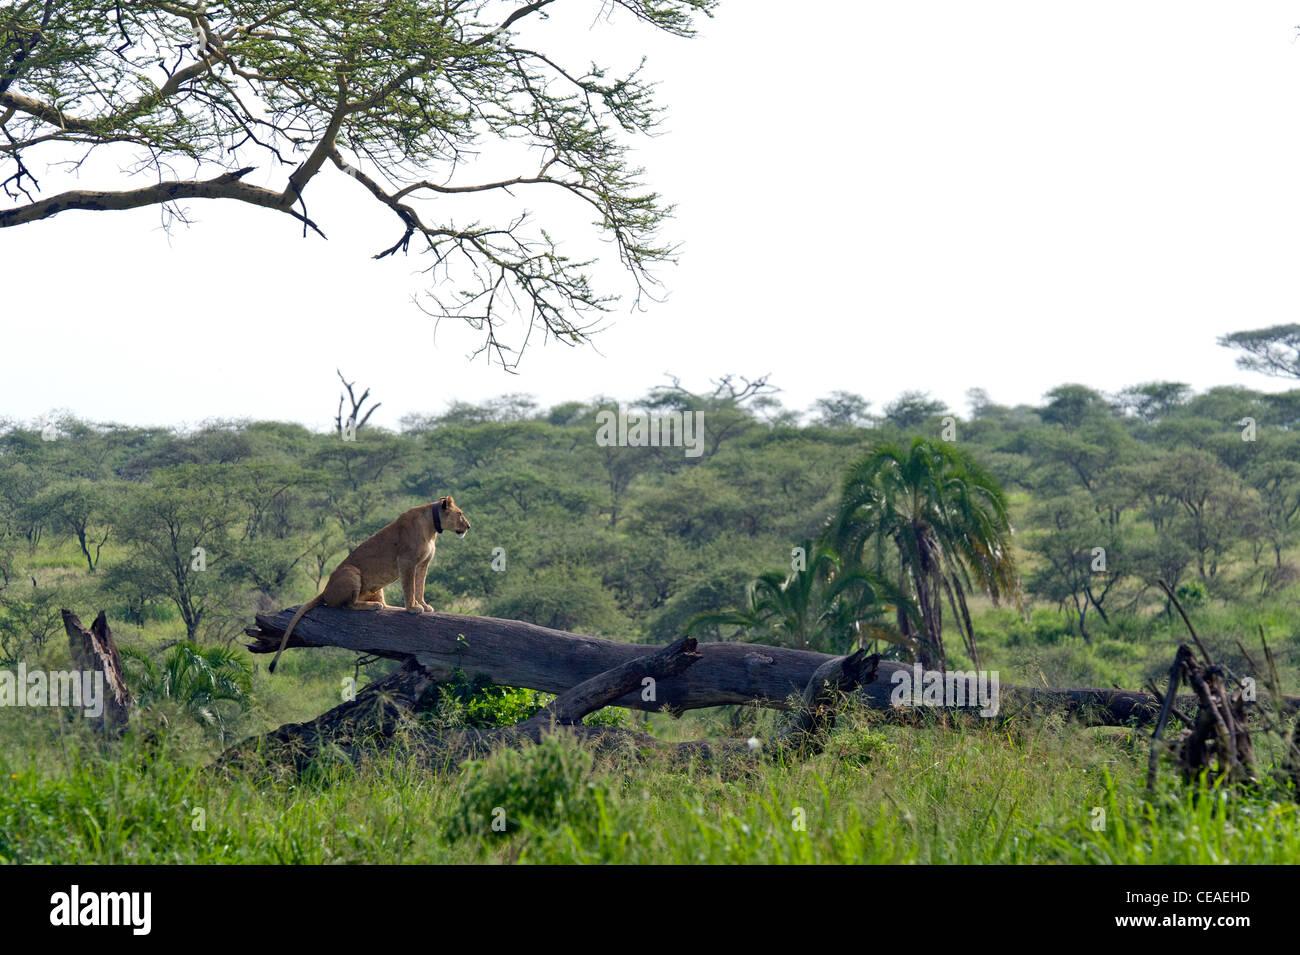 Lioness Panthera leo with a radio collar sitting on a fallen tree at Seronera in Serengeti, Tanzania - Stock Image